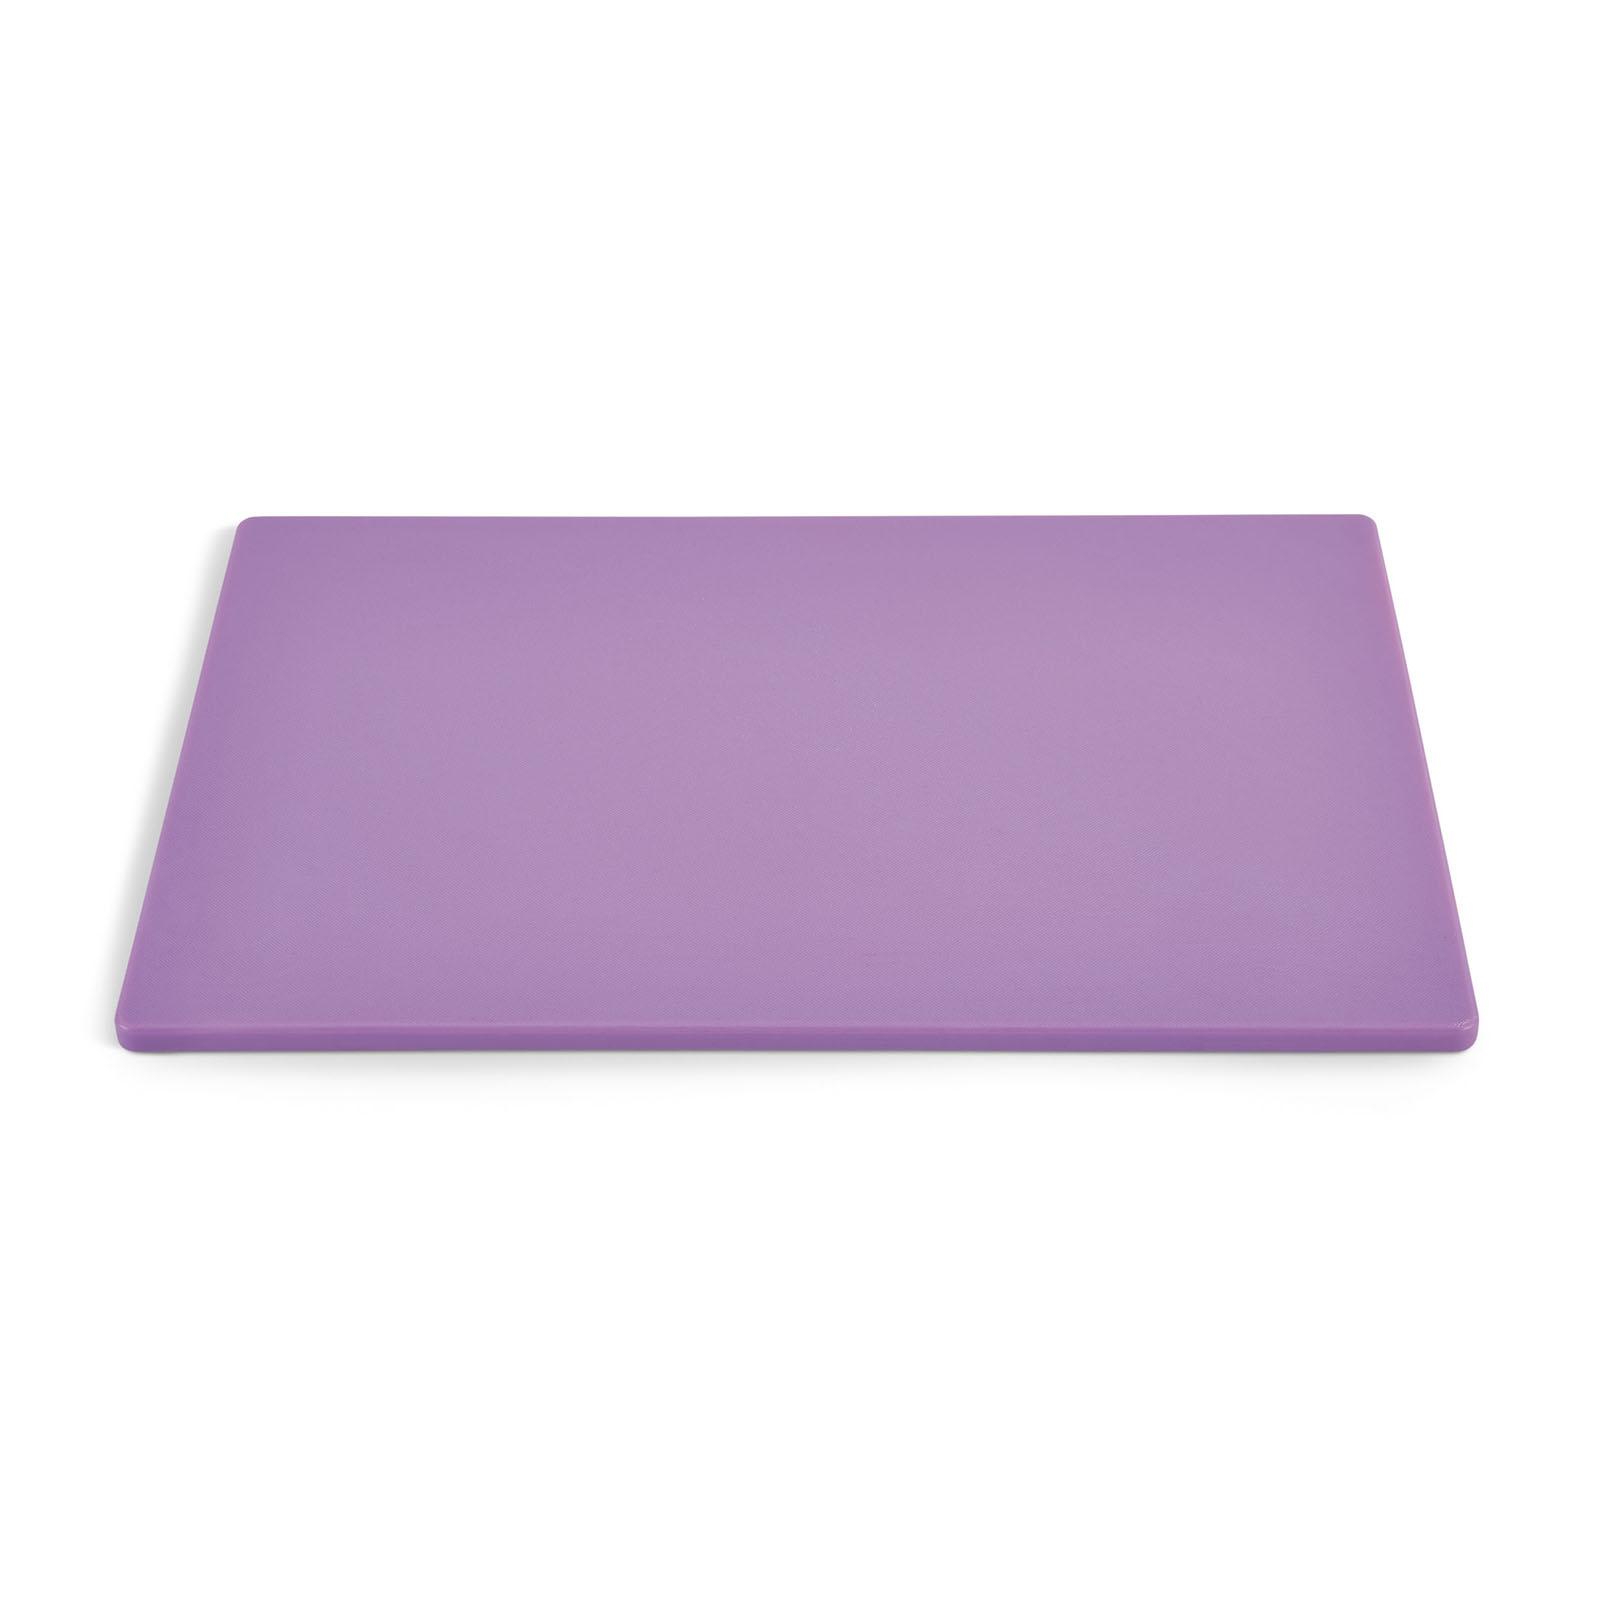 Vollrath 5200080 cutting board, plastic